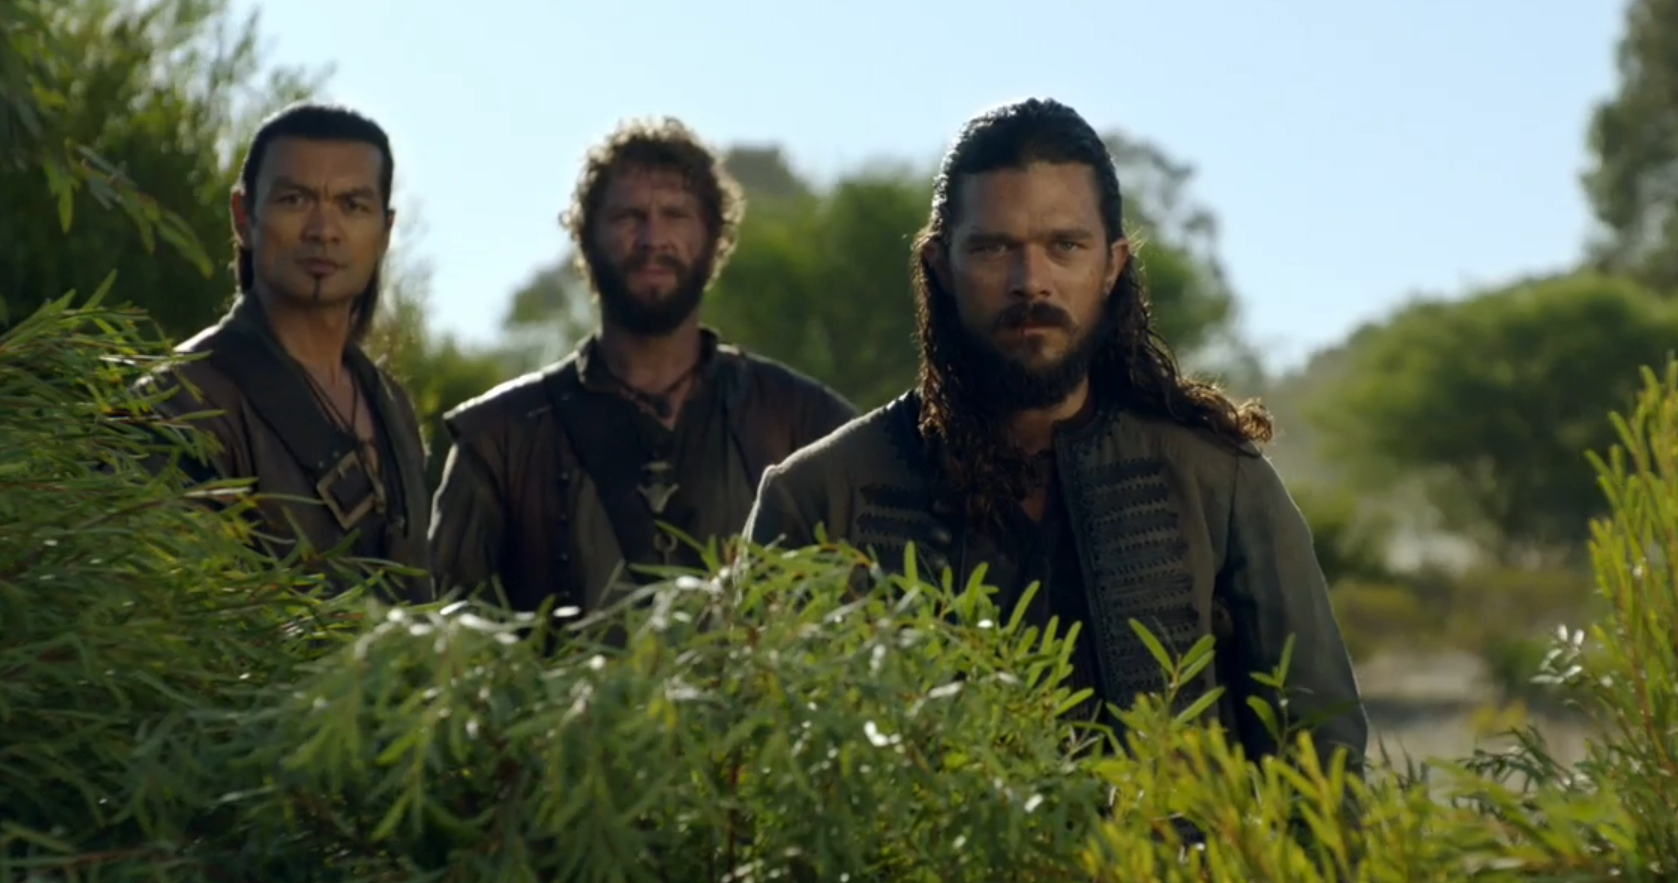 Black Sails Season 4 Episode 5 Long John Silver and Winston